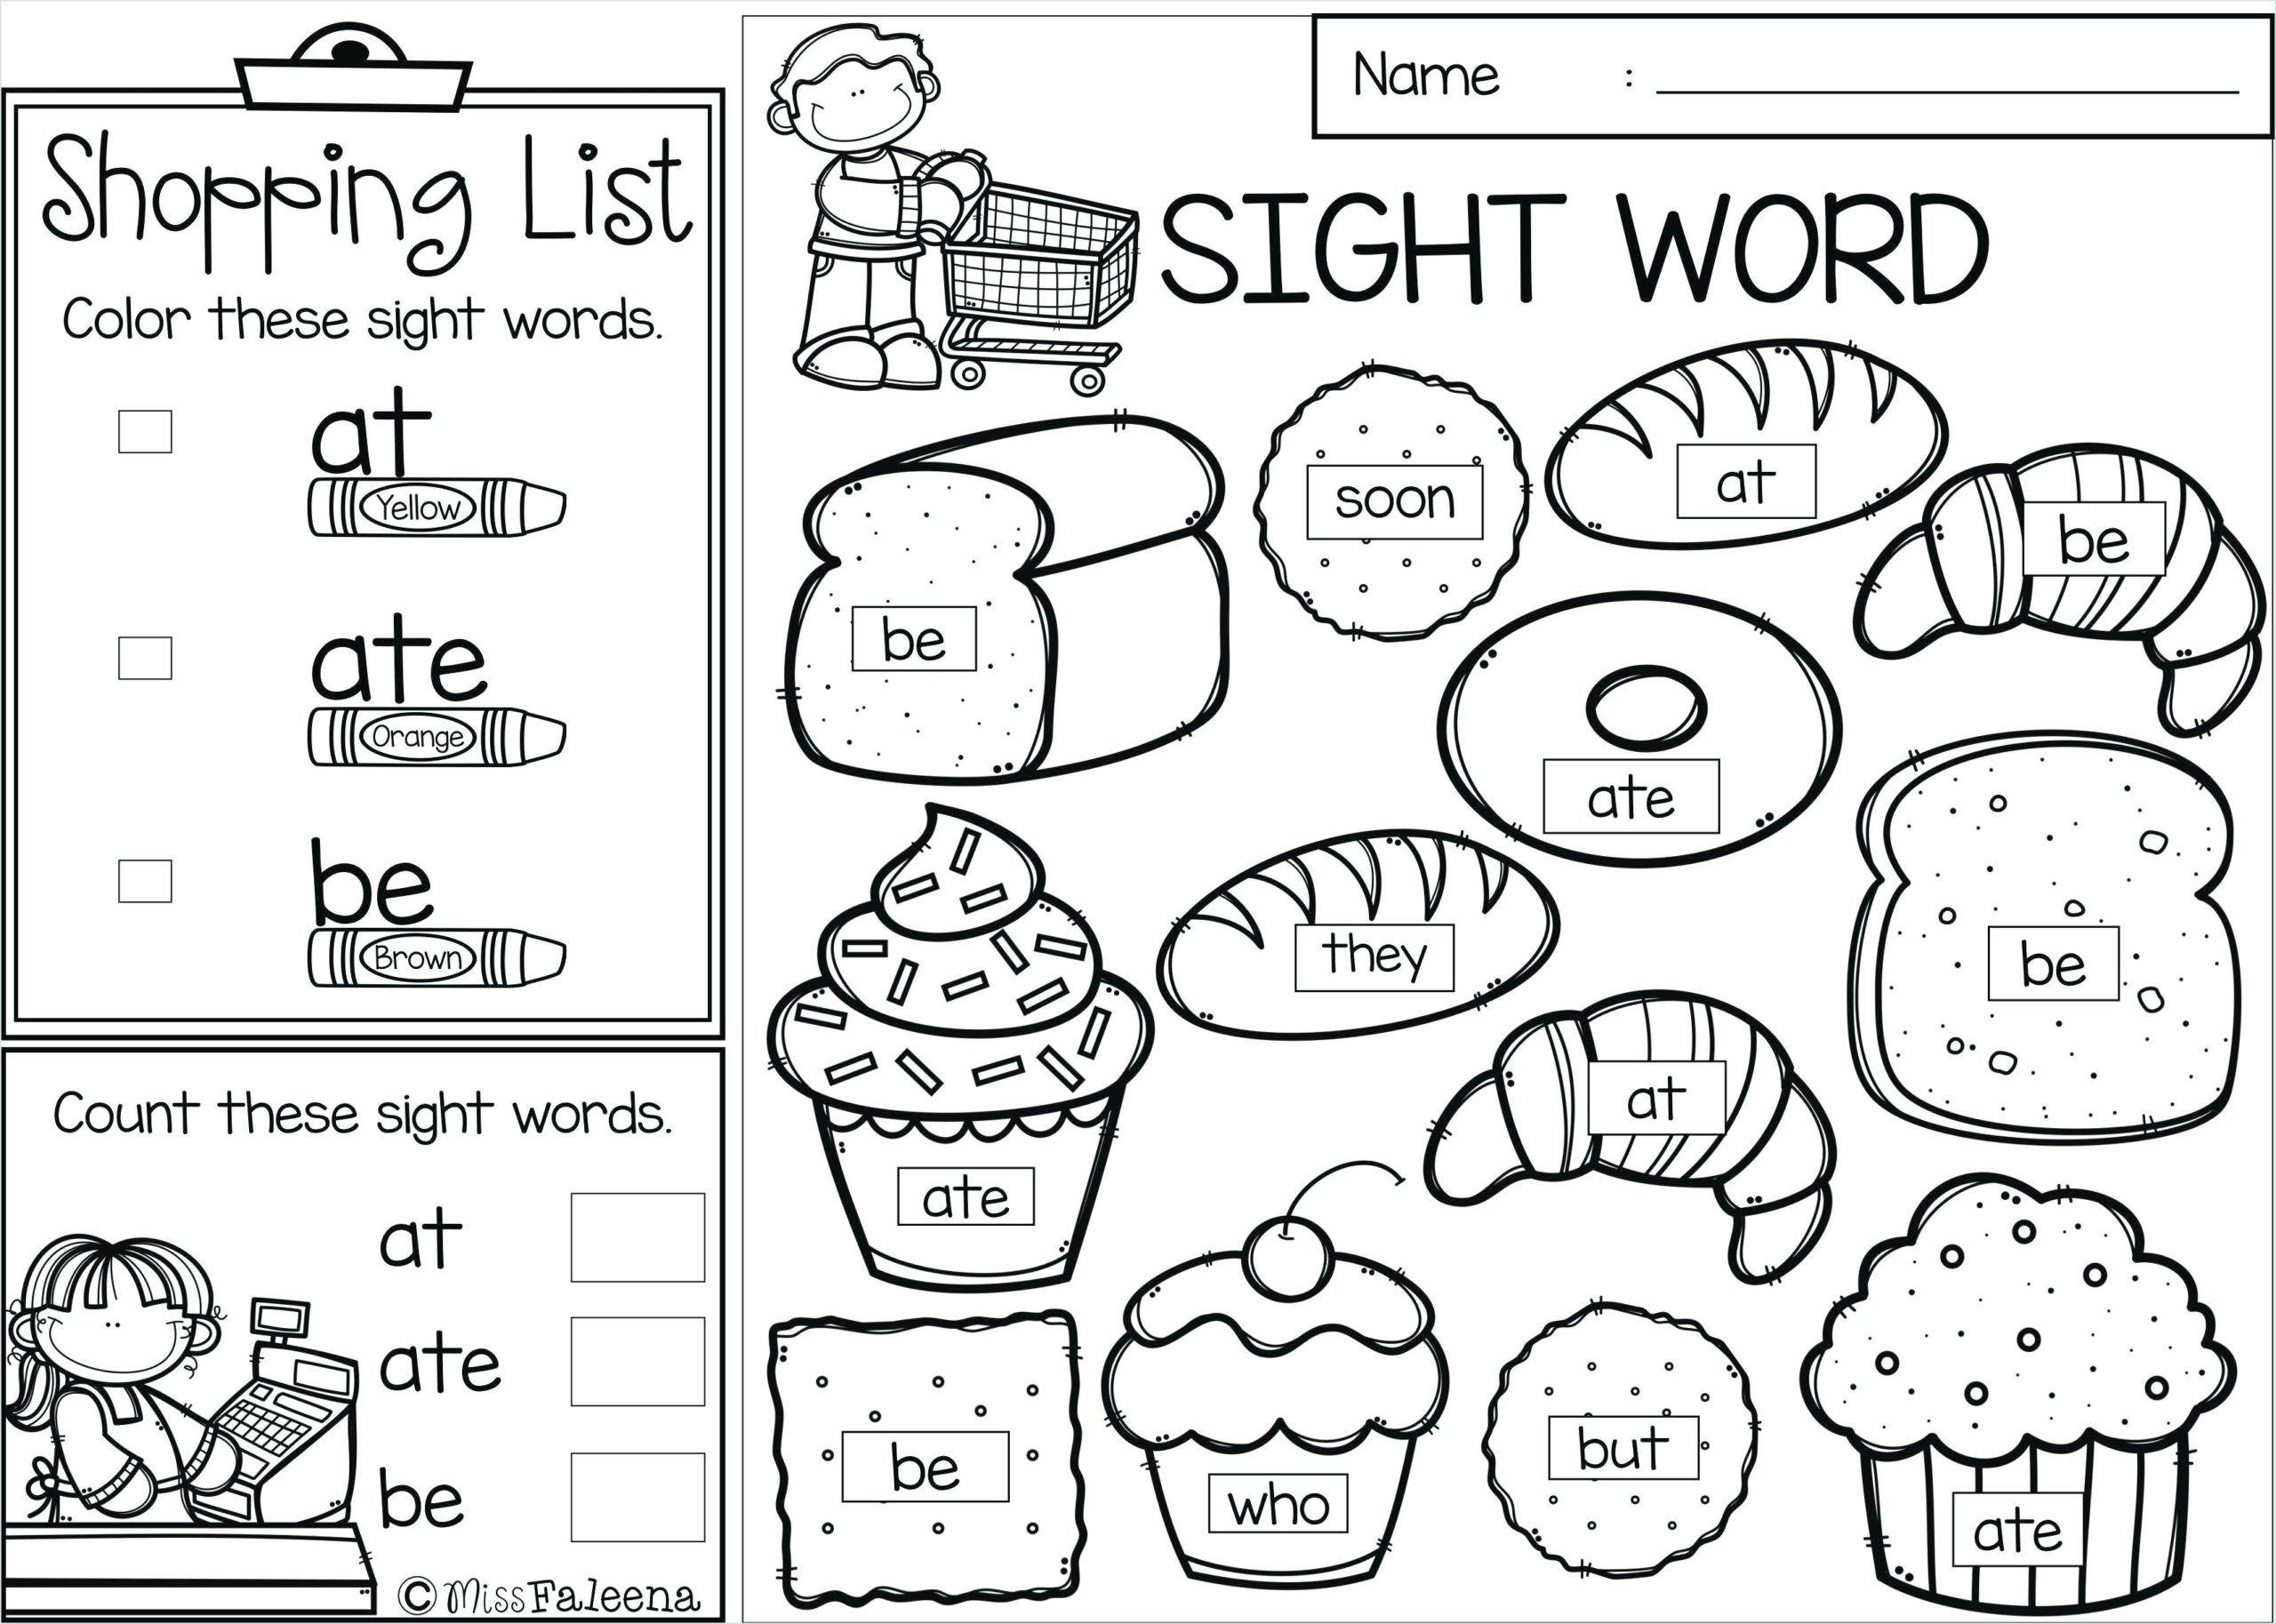 6 Animals Worksheets For Kids Teachers Free Worksheet For